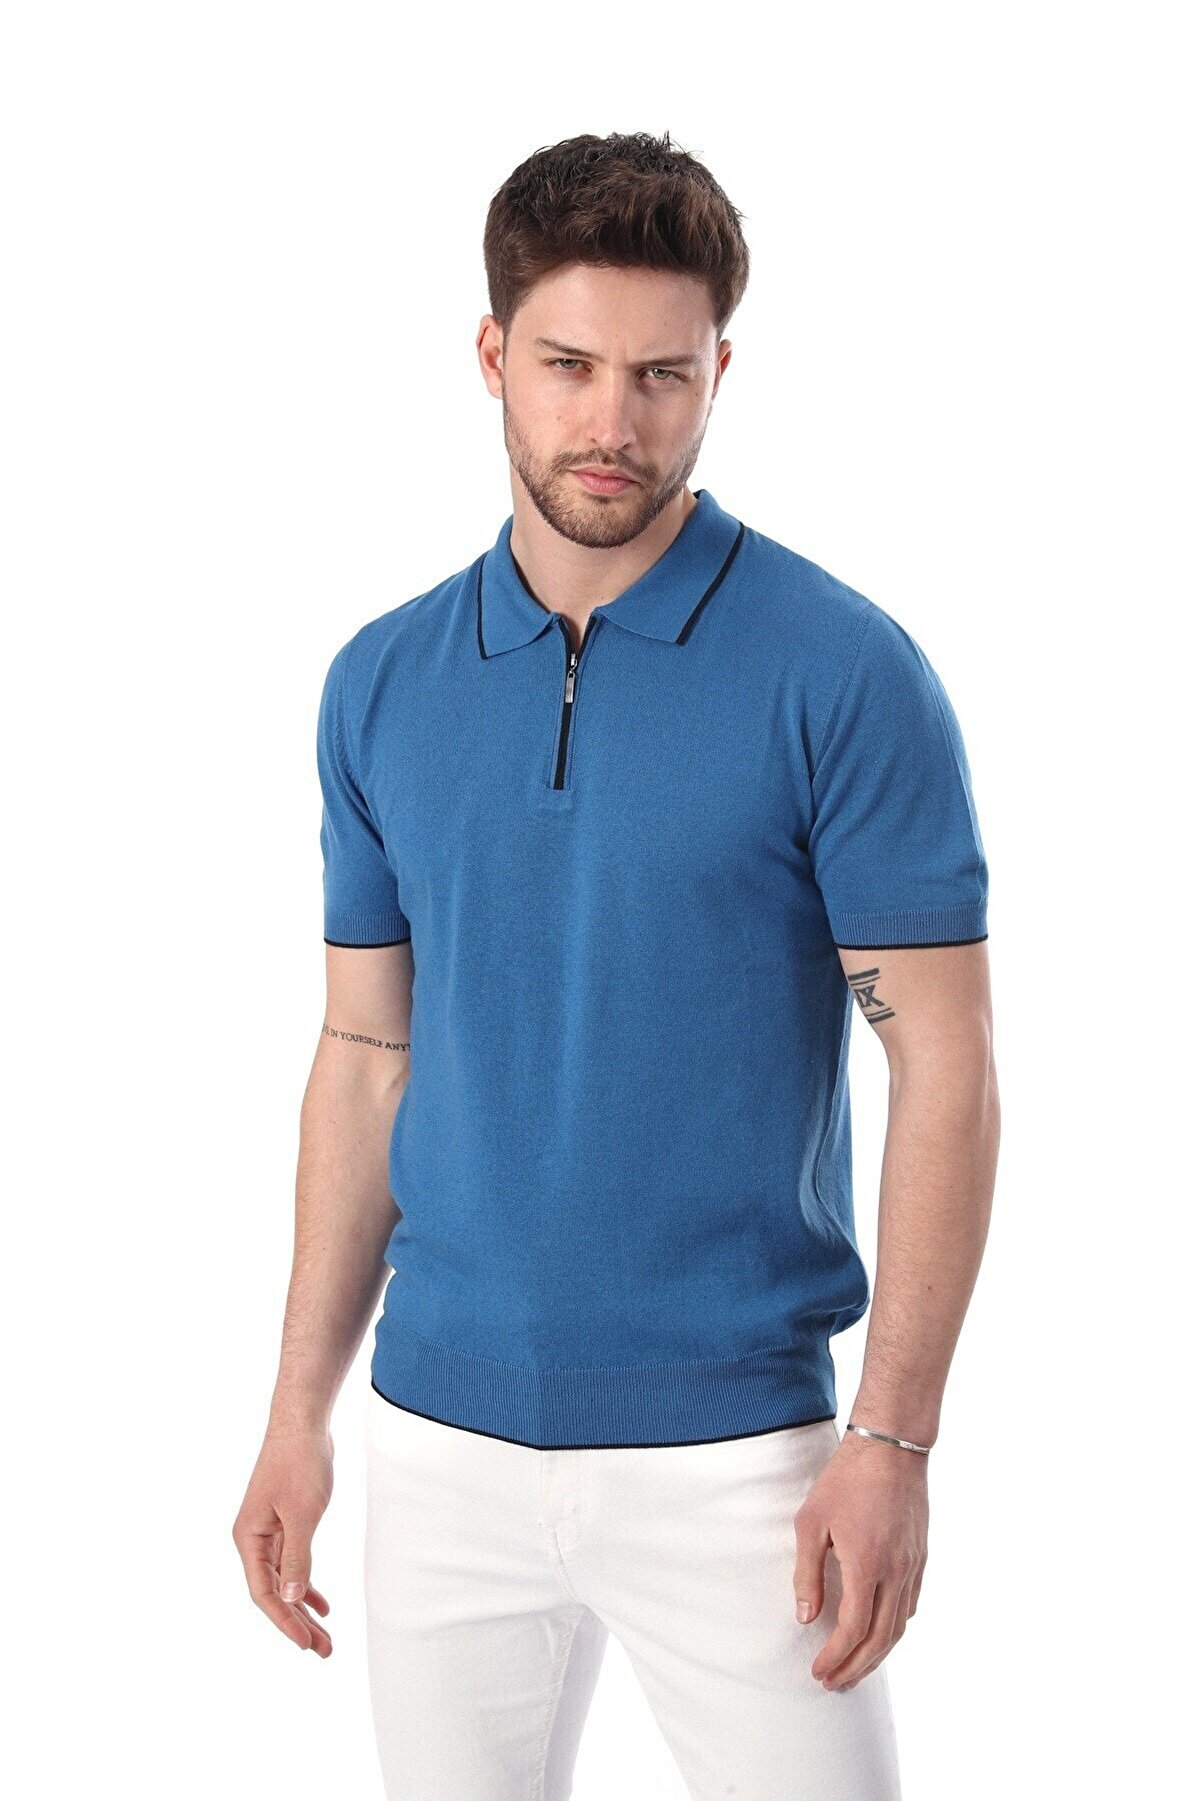 Ferraro Erkek Mavi Havacı Yaka Şerit Fermuarlı Pamuk Triko T-shirt